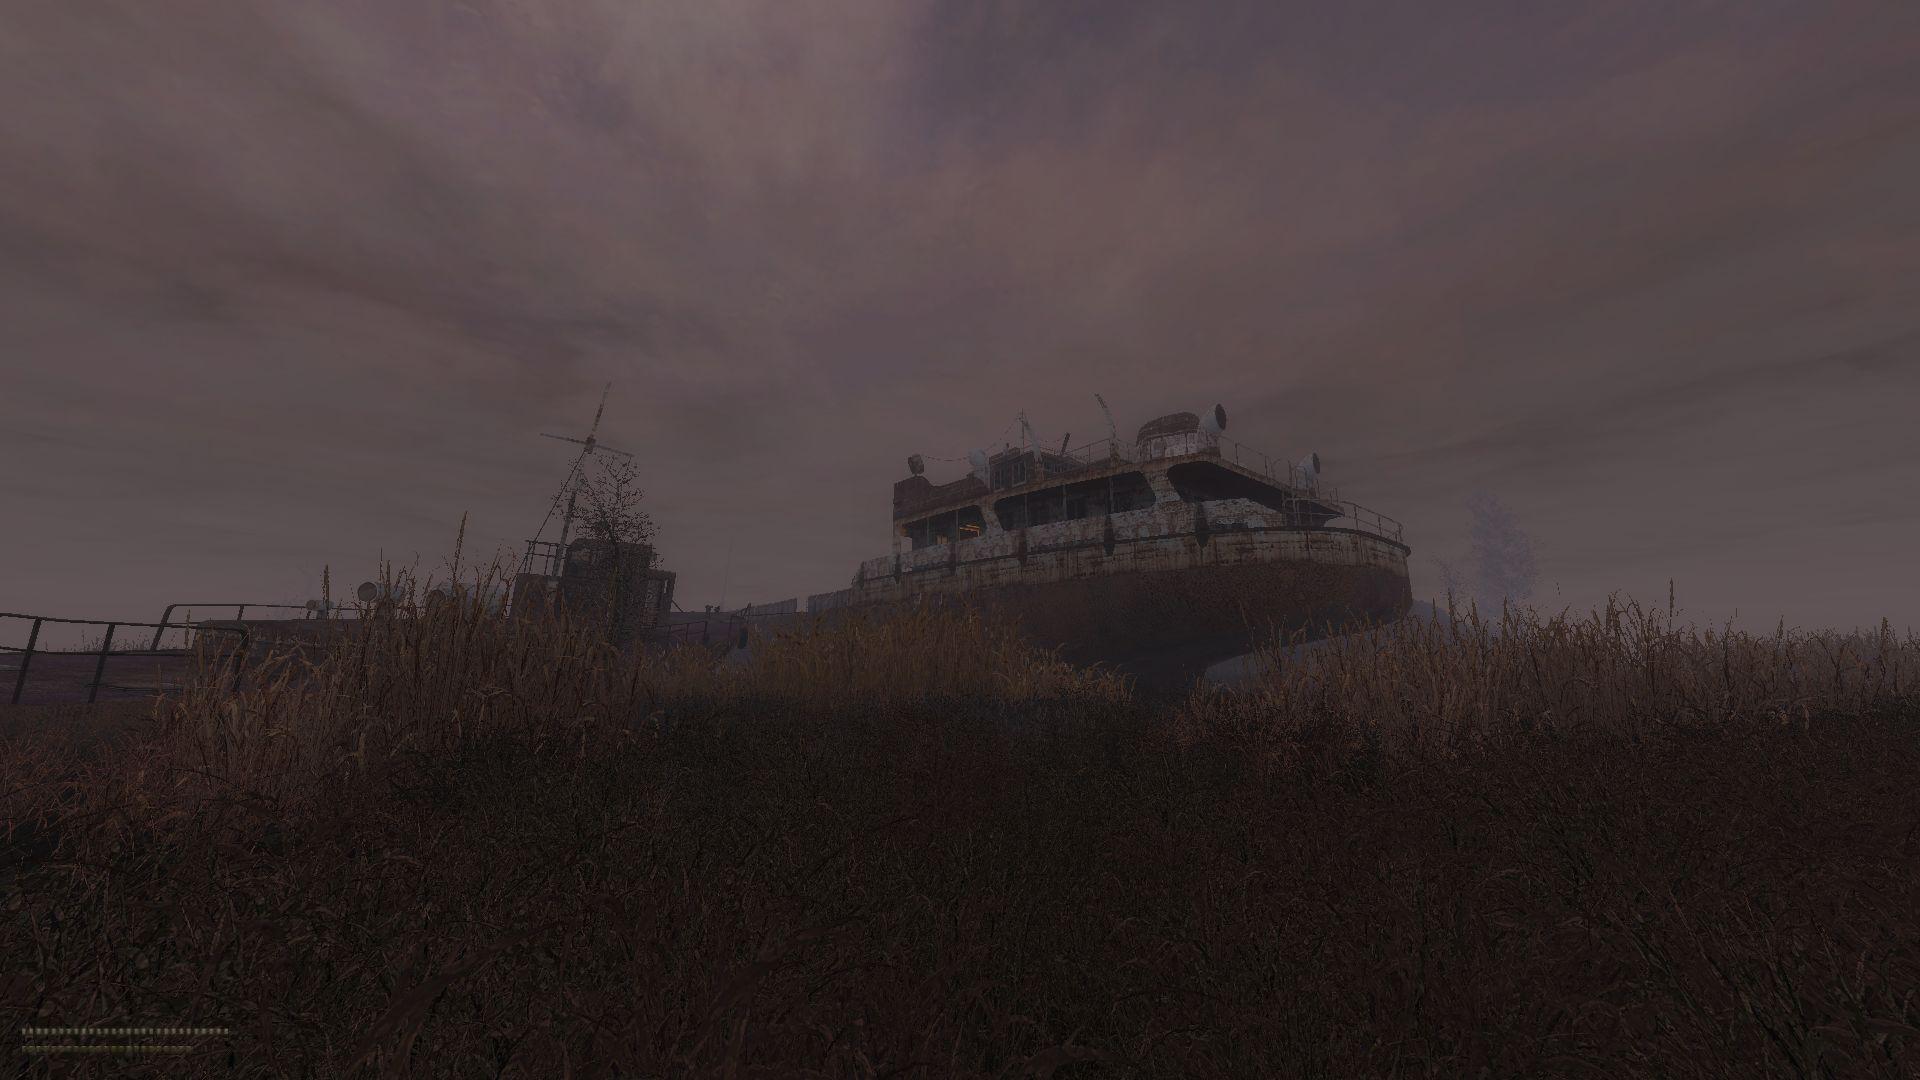 00037.Jpg - S.T.A.L.K.E.R.: Call of Pripyat